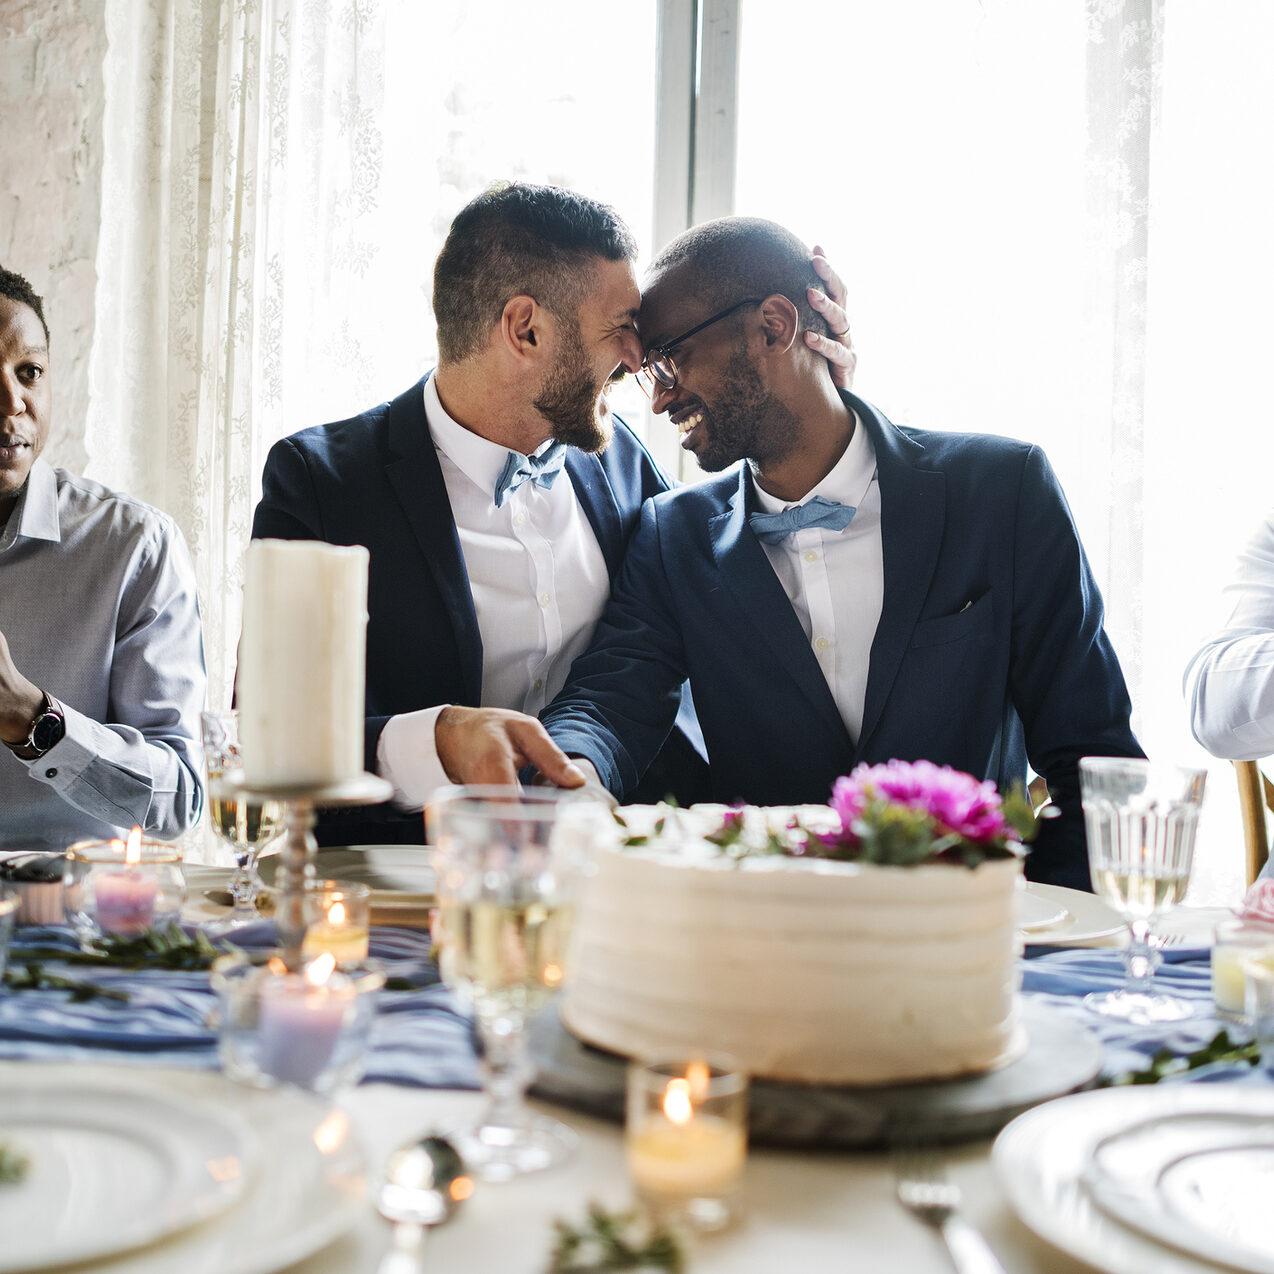 gay-men-at-wedding-reception